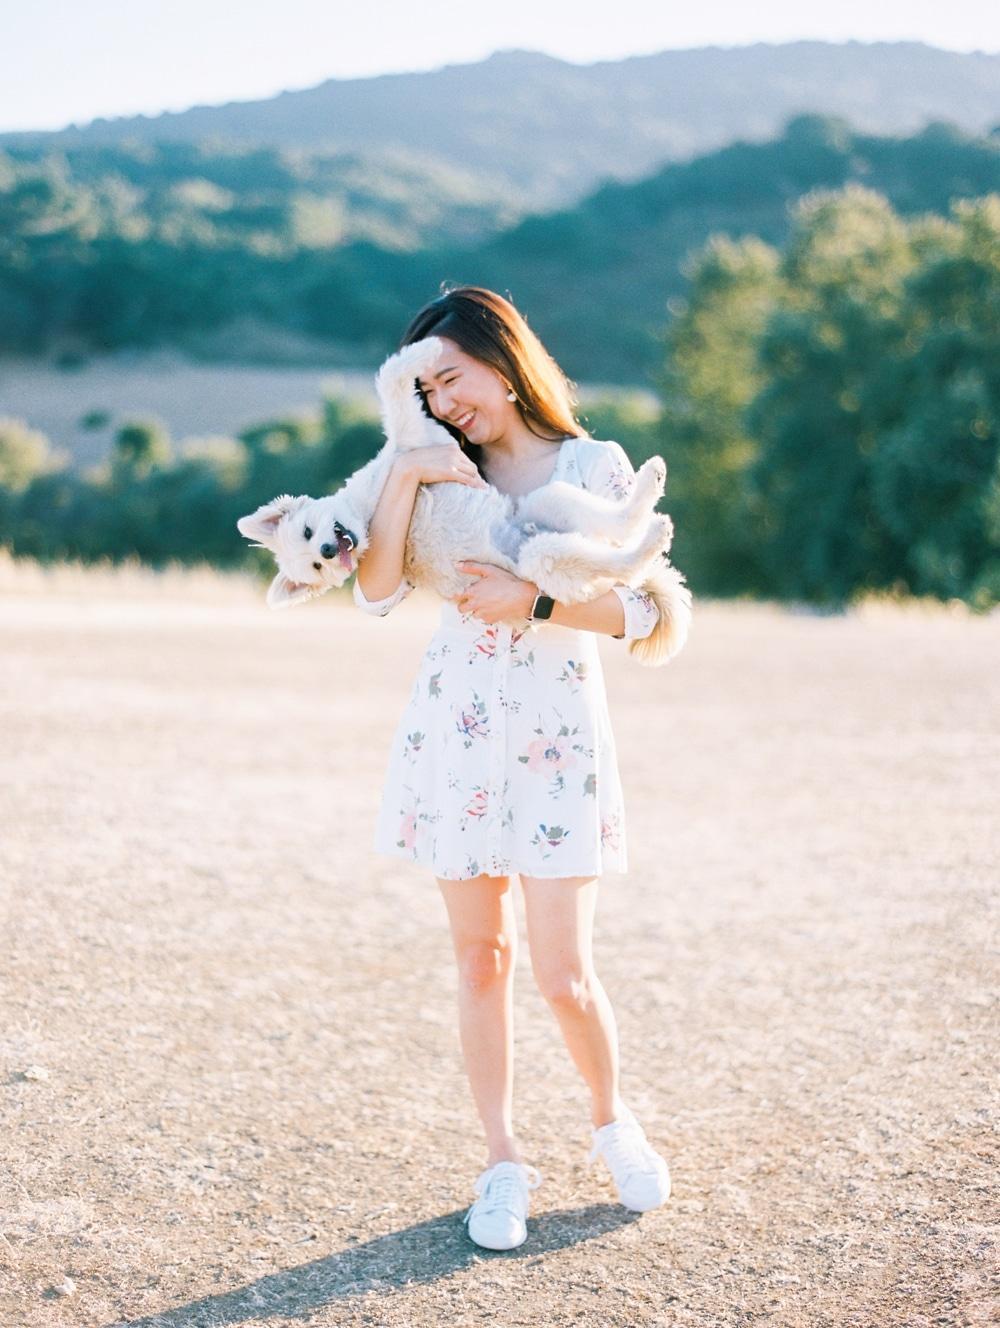 Kristin-La-Voie-Photography-california-wedding-photographer-dog-session-rancho-san-antonio-los-altos-28